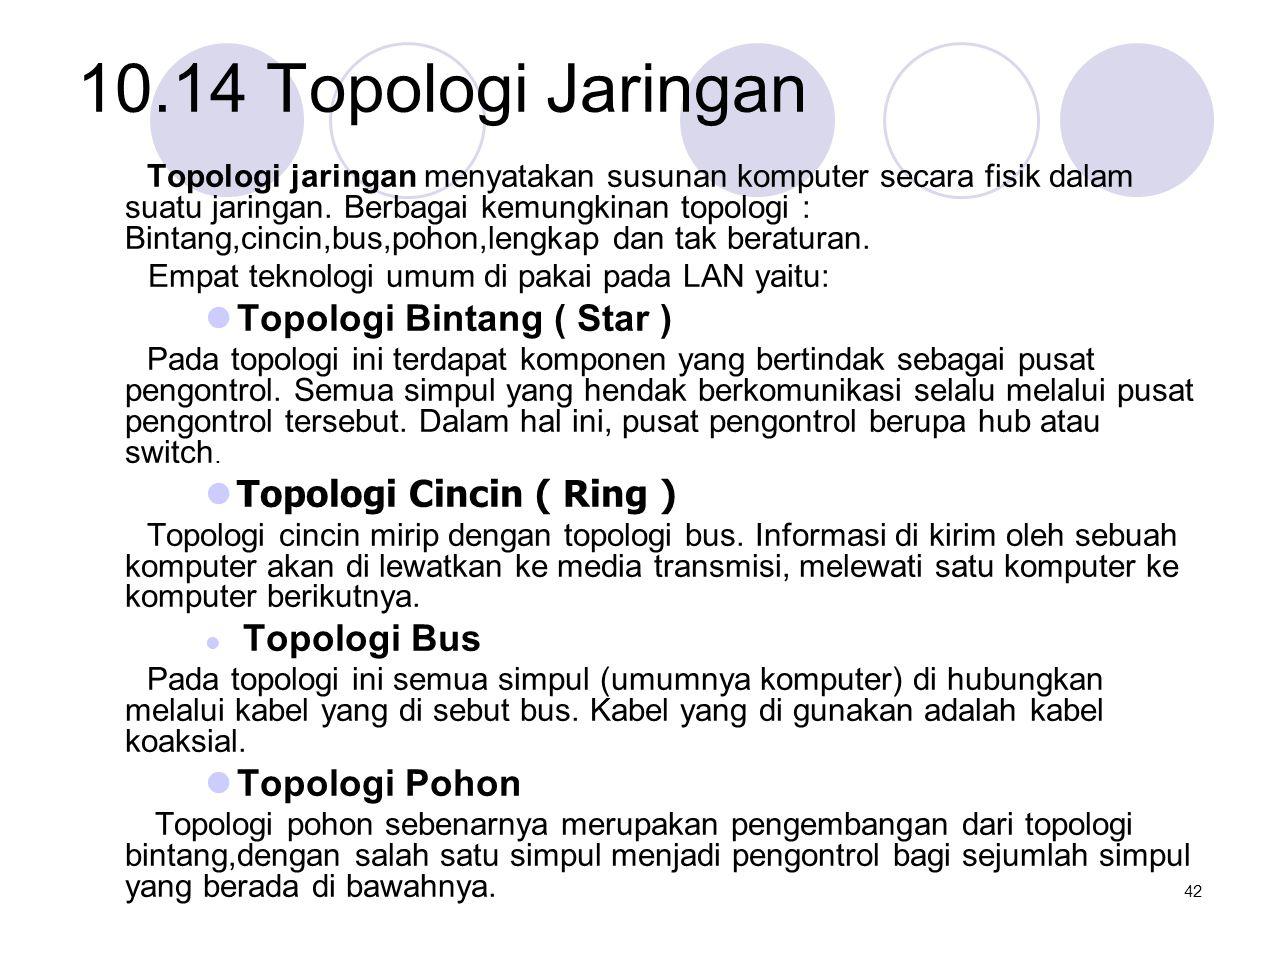 10.14 Topologi Jaringan Topologi jaringan menyatakan susunan komputer secara fisik dalam suatu jaringan. Berbagai kemungkinan topologi : Bintang,cinci